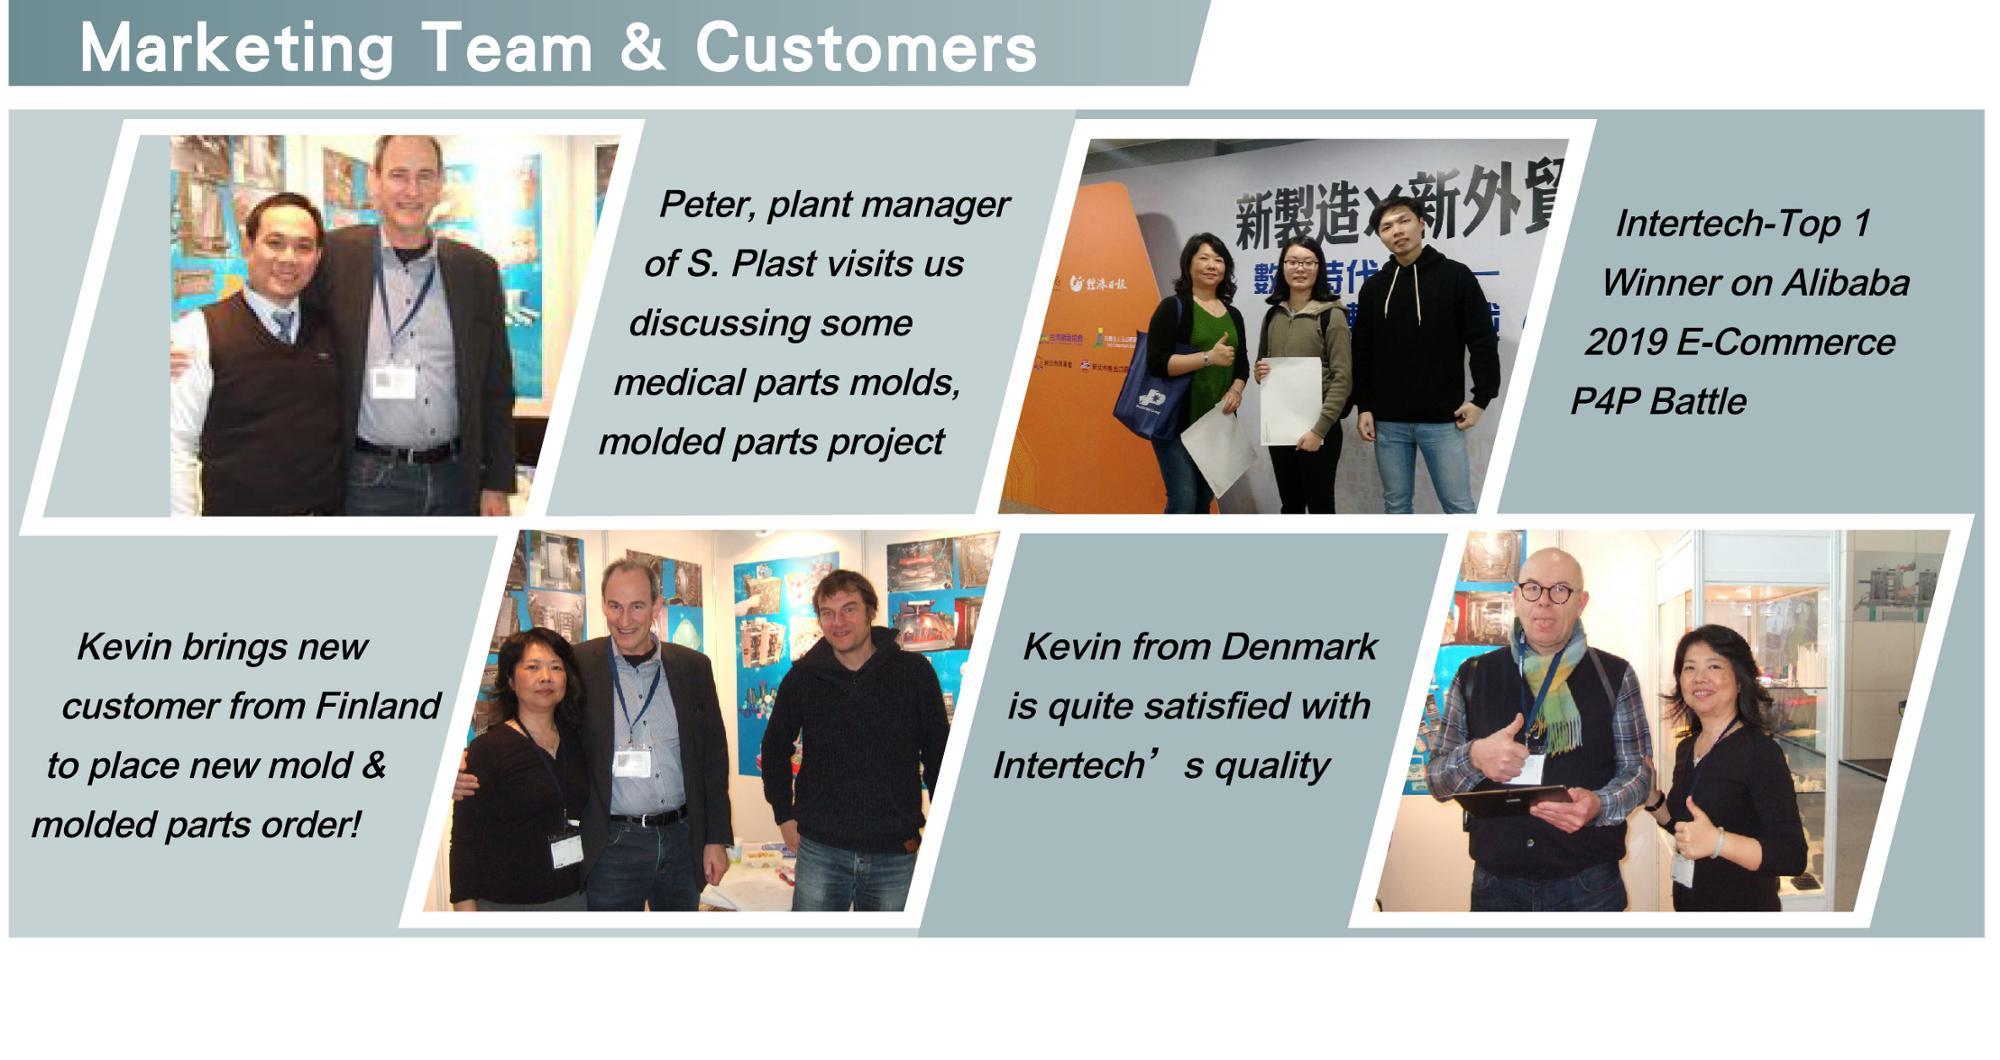 marketing team & customers